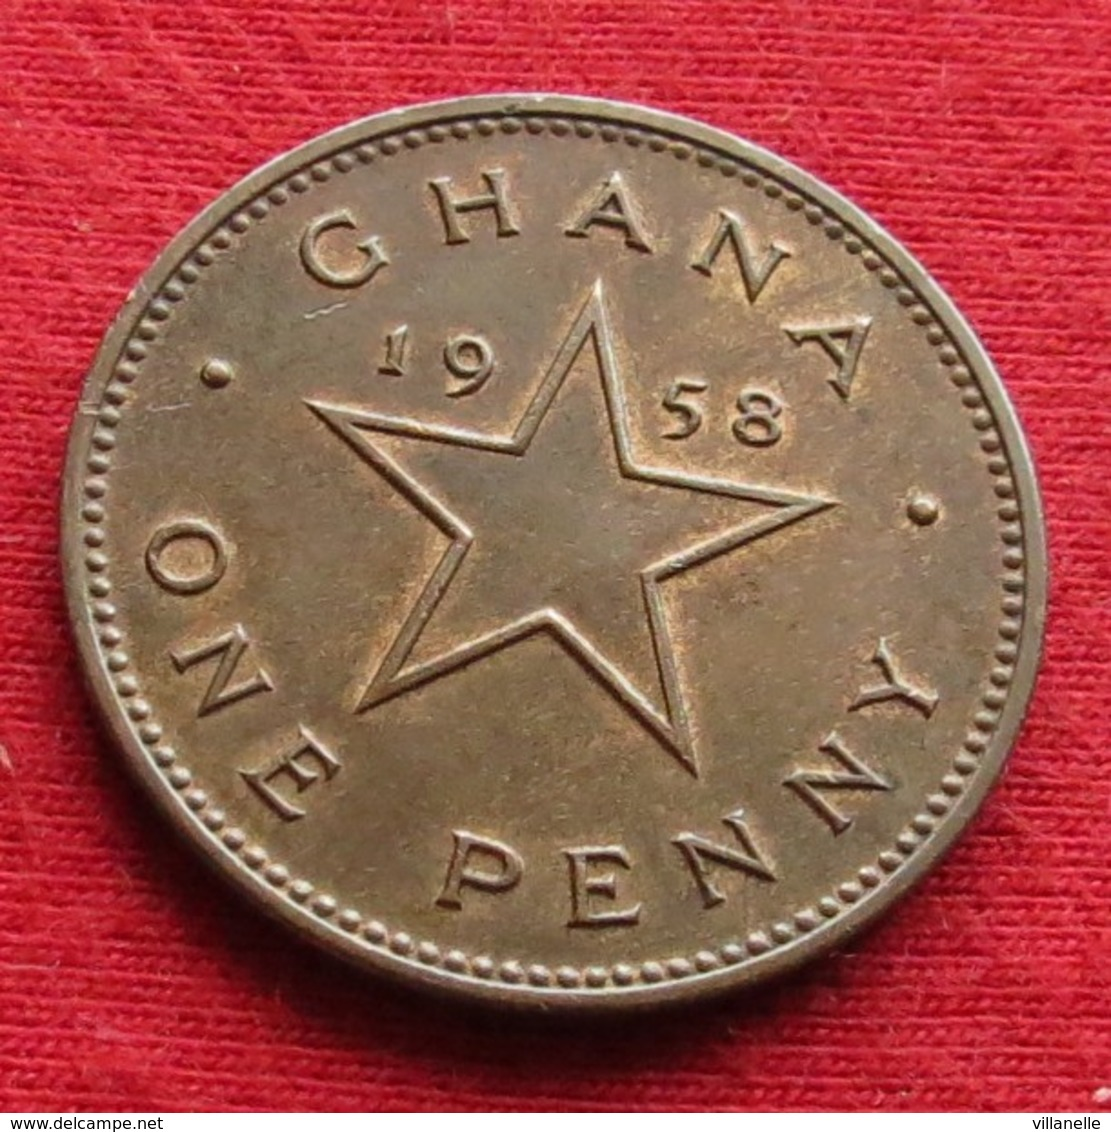 Ghana 1 One Penny 1958 KM# 2 Gana - Ghana